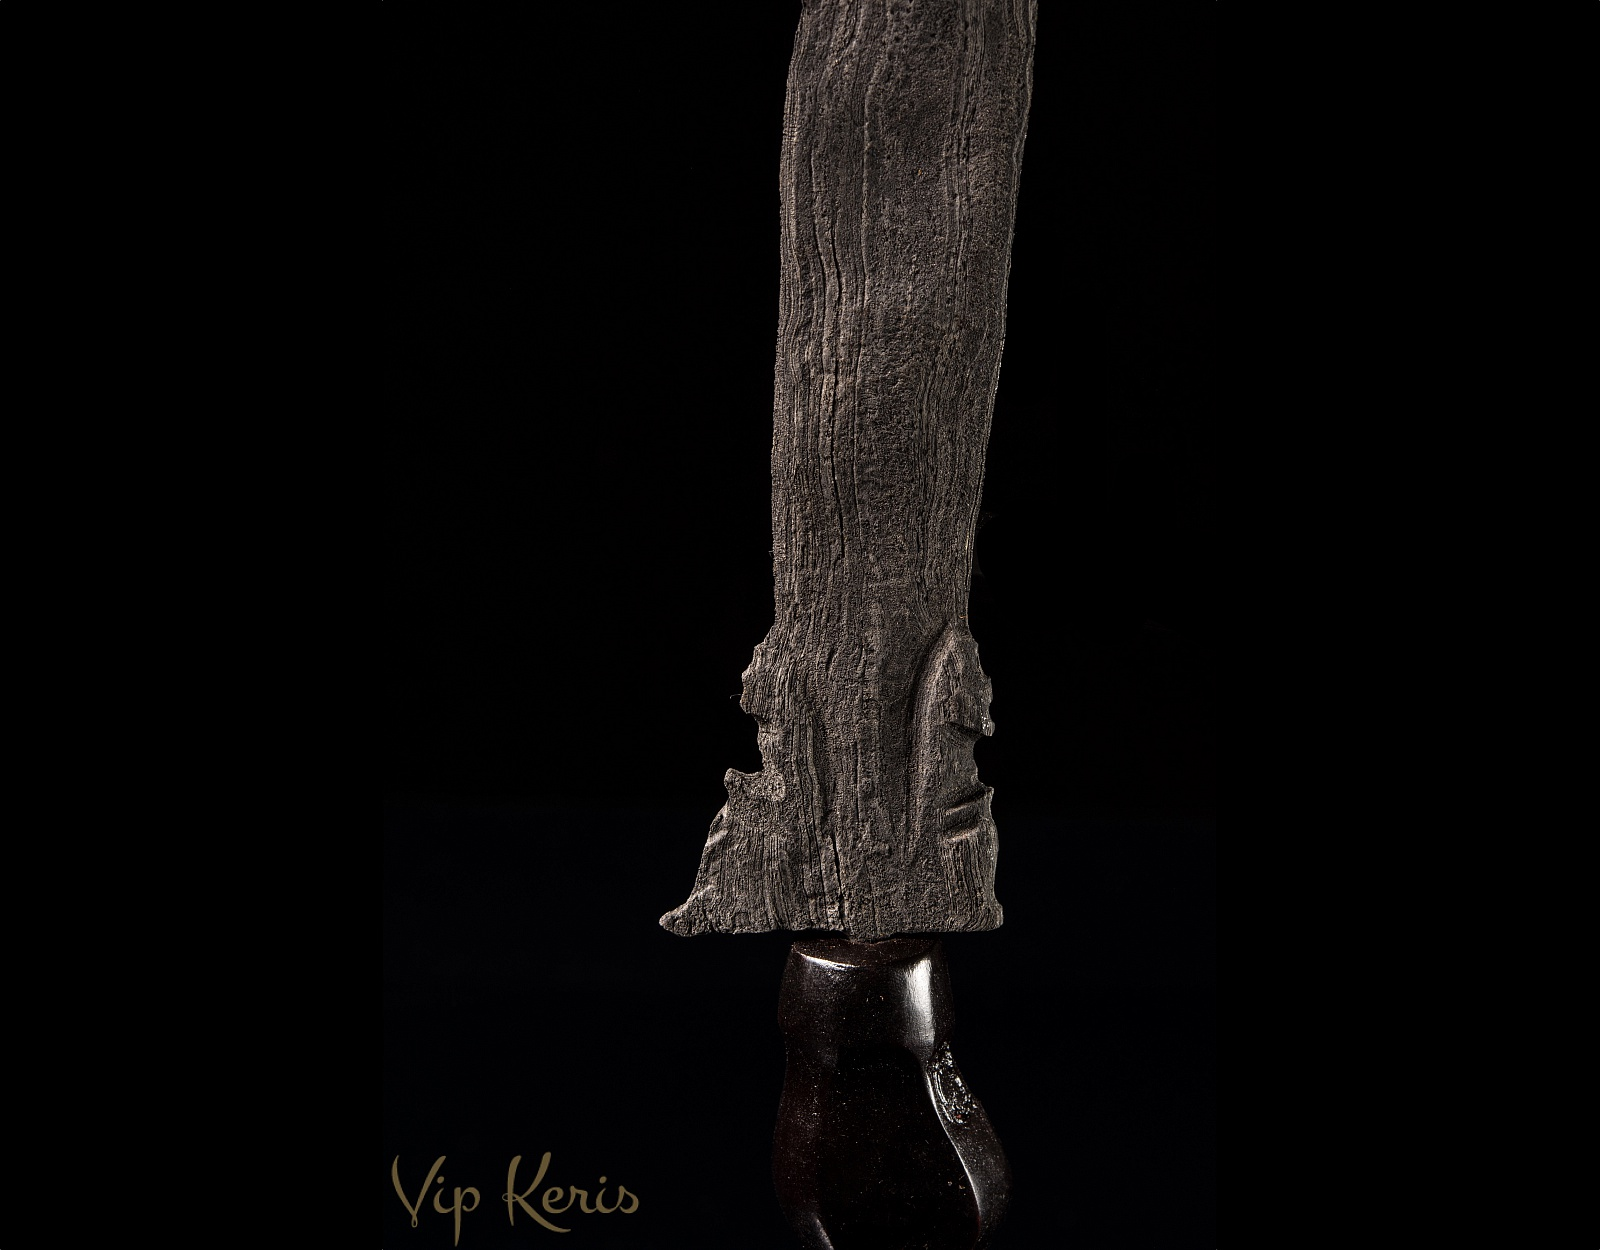 Нож Крис Phutut Sajen, dua penyihir фото VipKeris